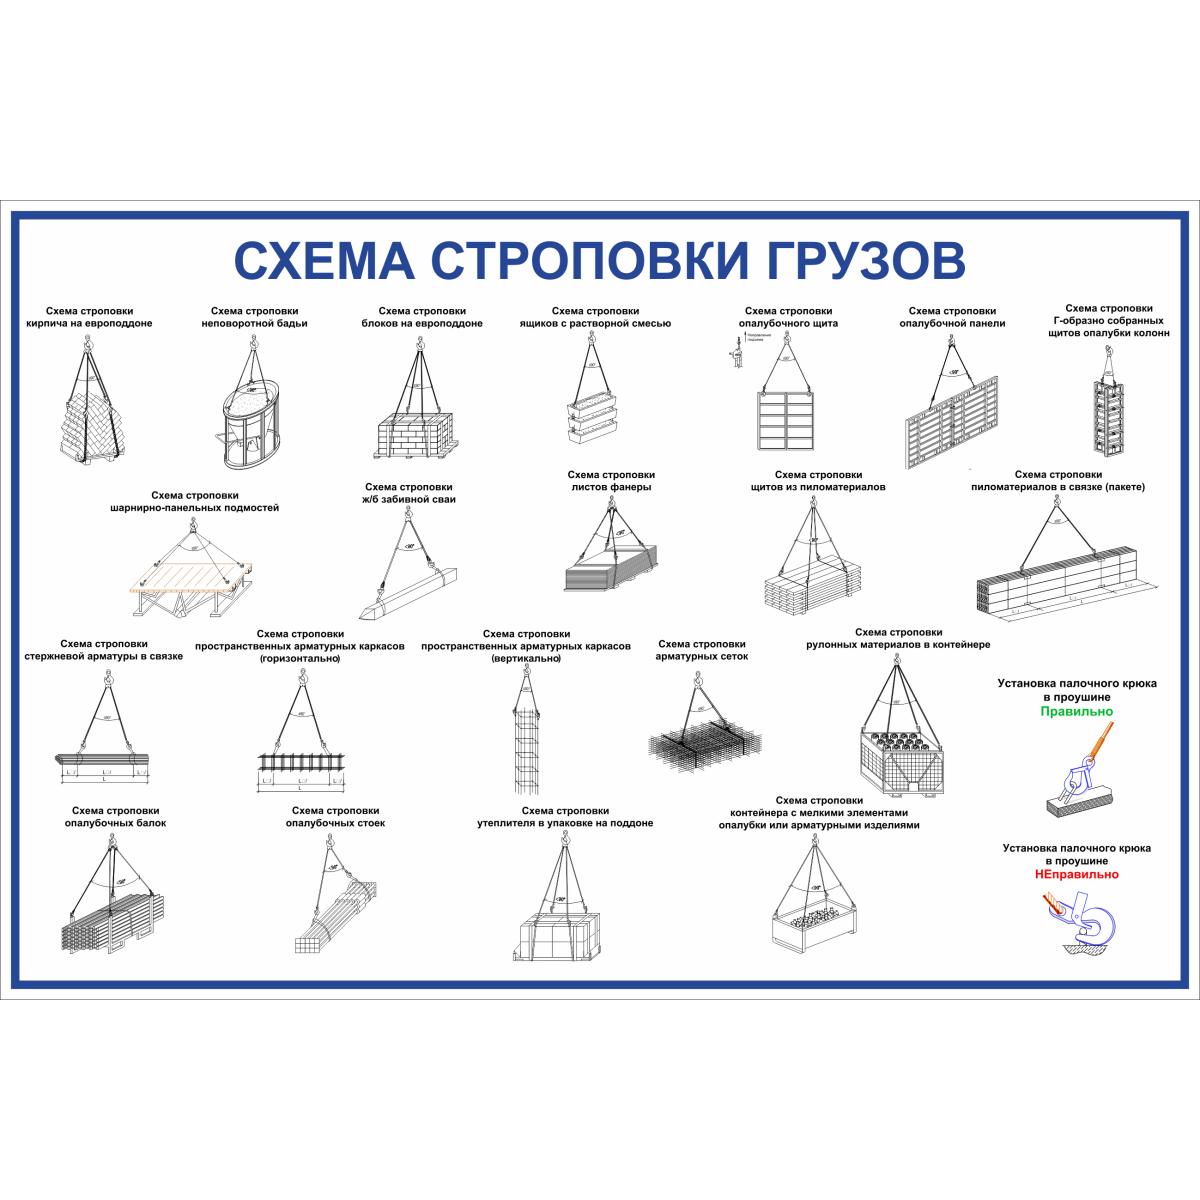 Плакат 2546 Схема строповки грузов 1200*800 мм